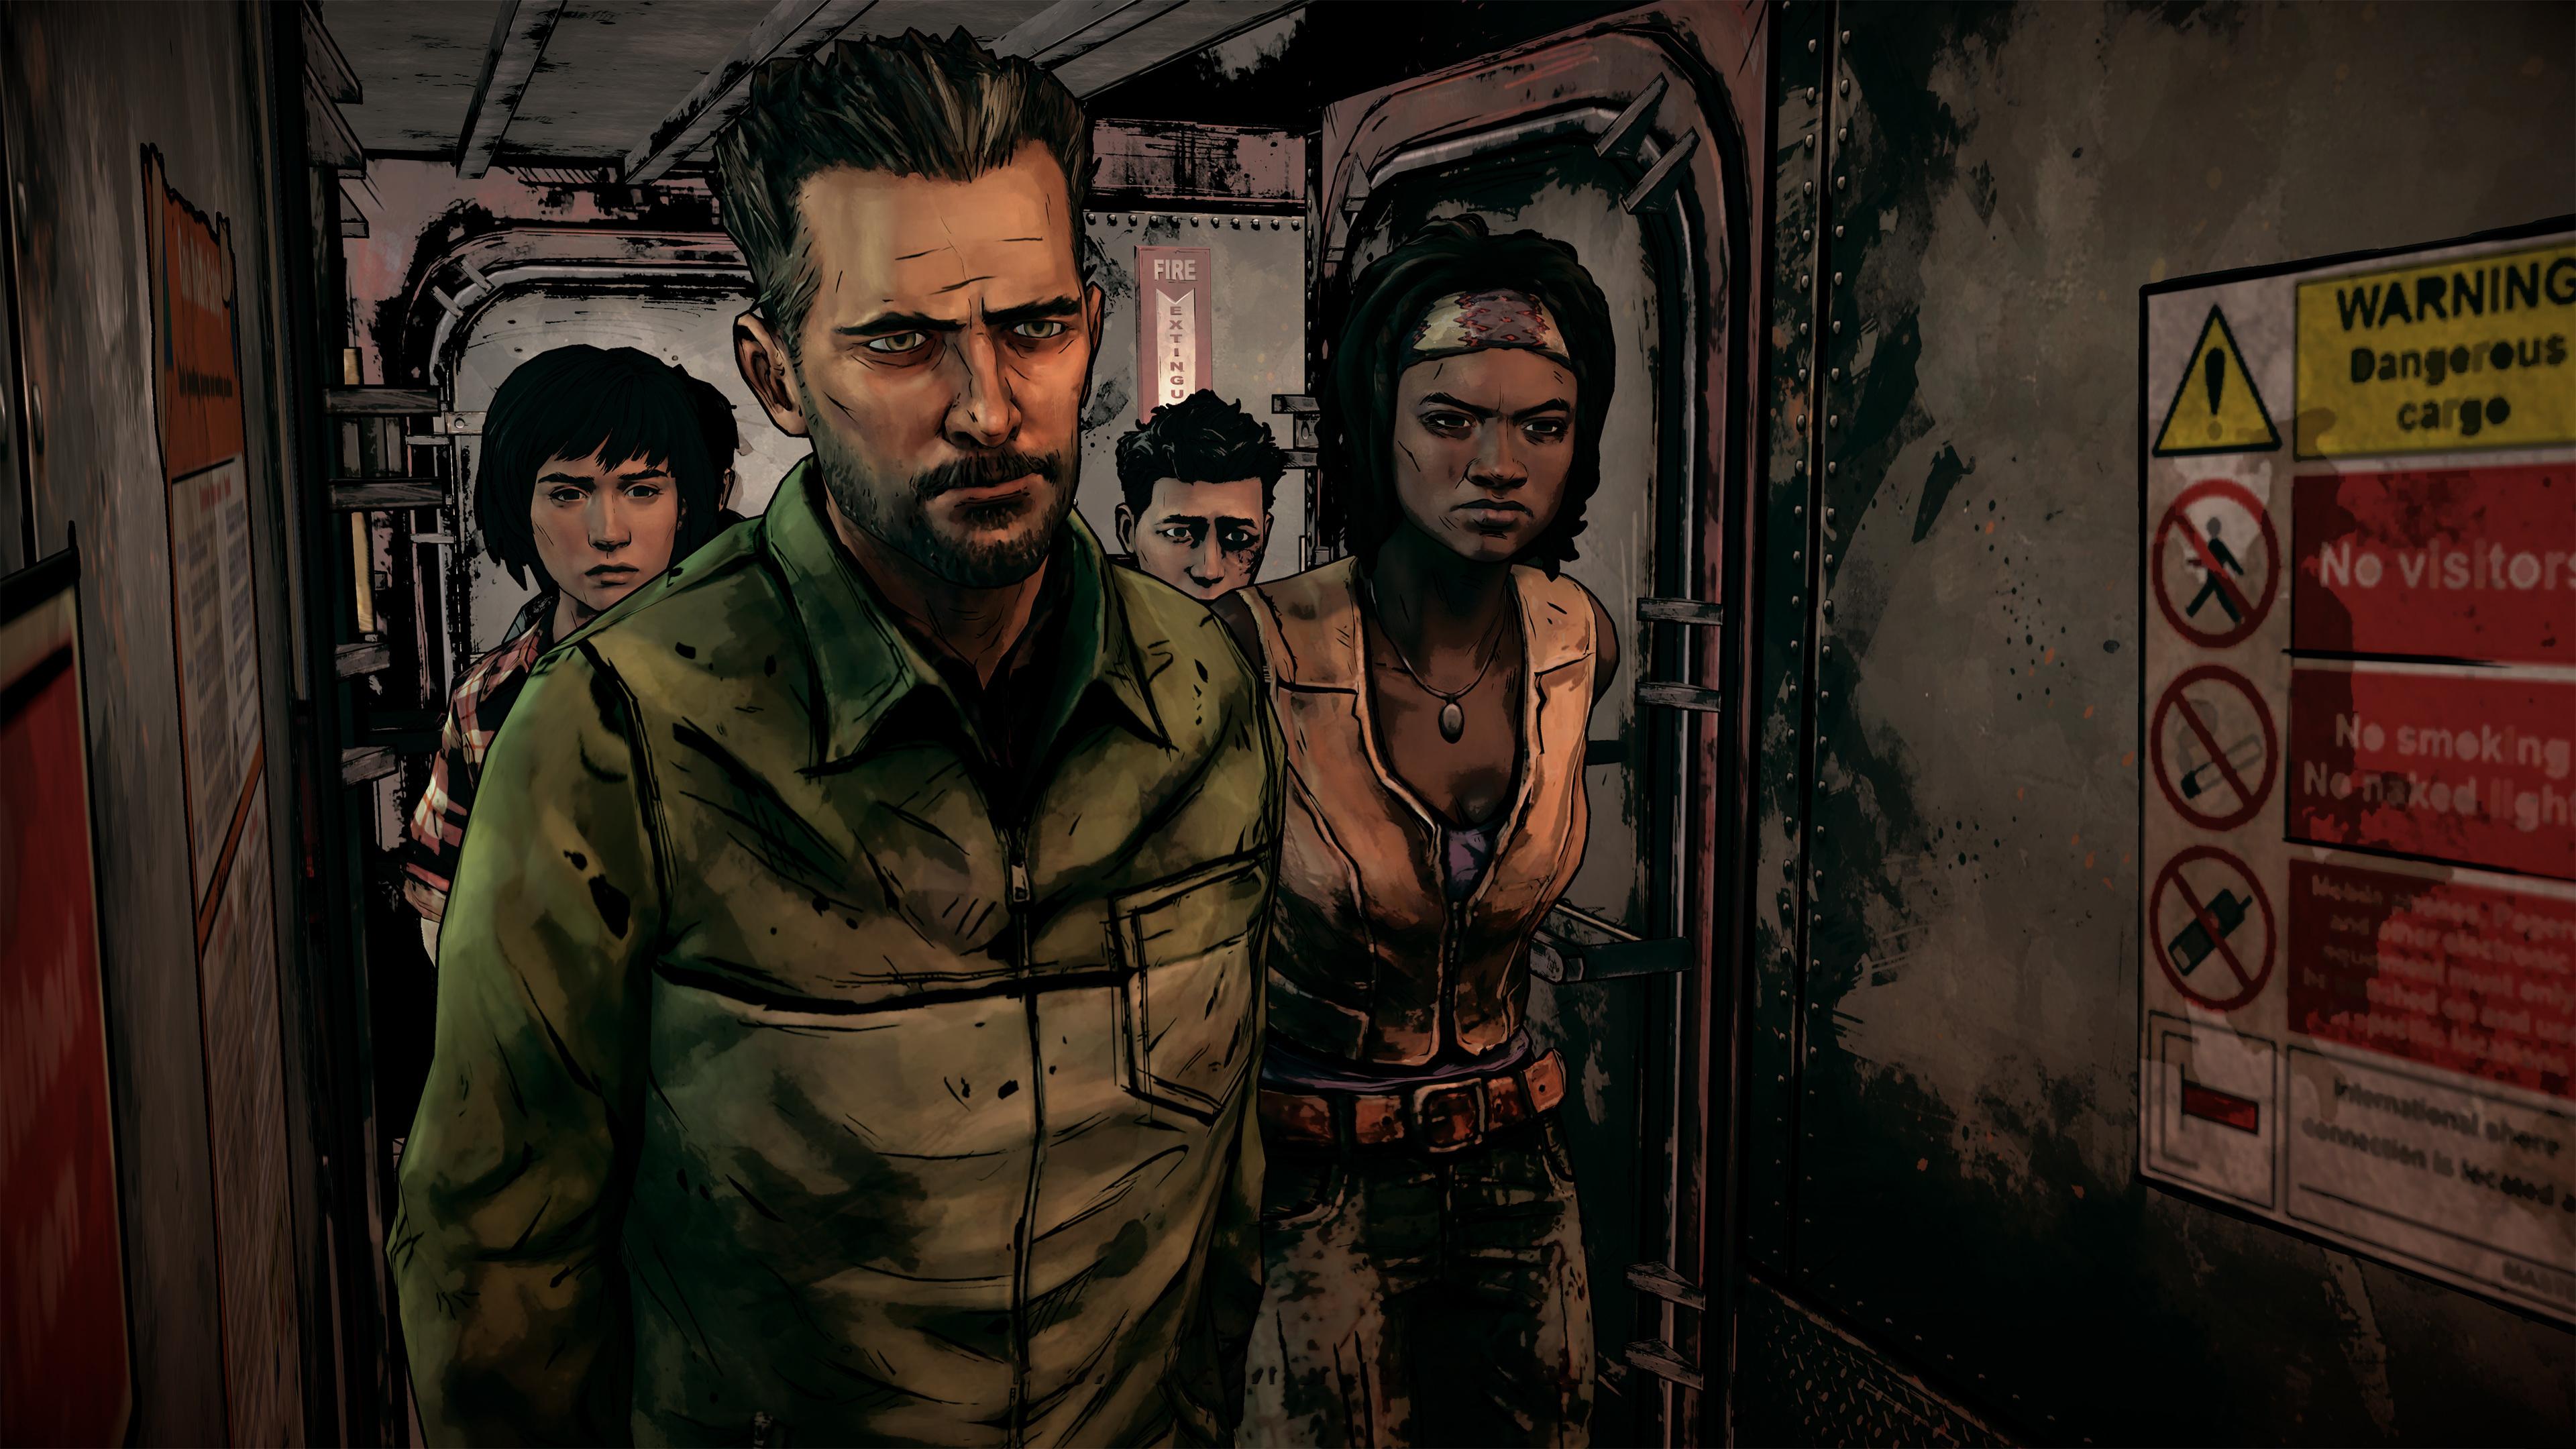 The Walking Dead The Telltale Graphic Black Wallpaper Hd Games 4k